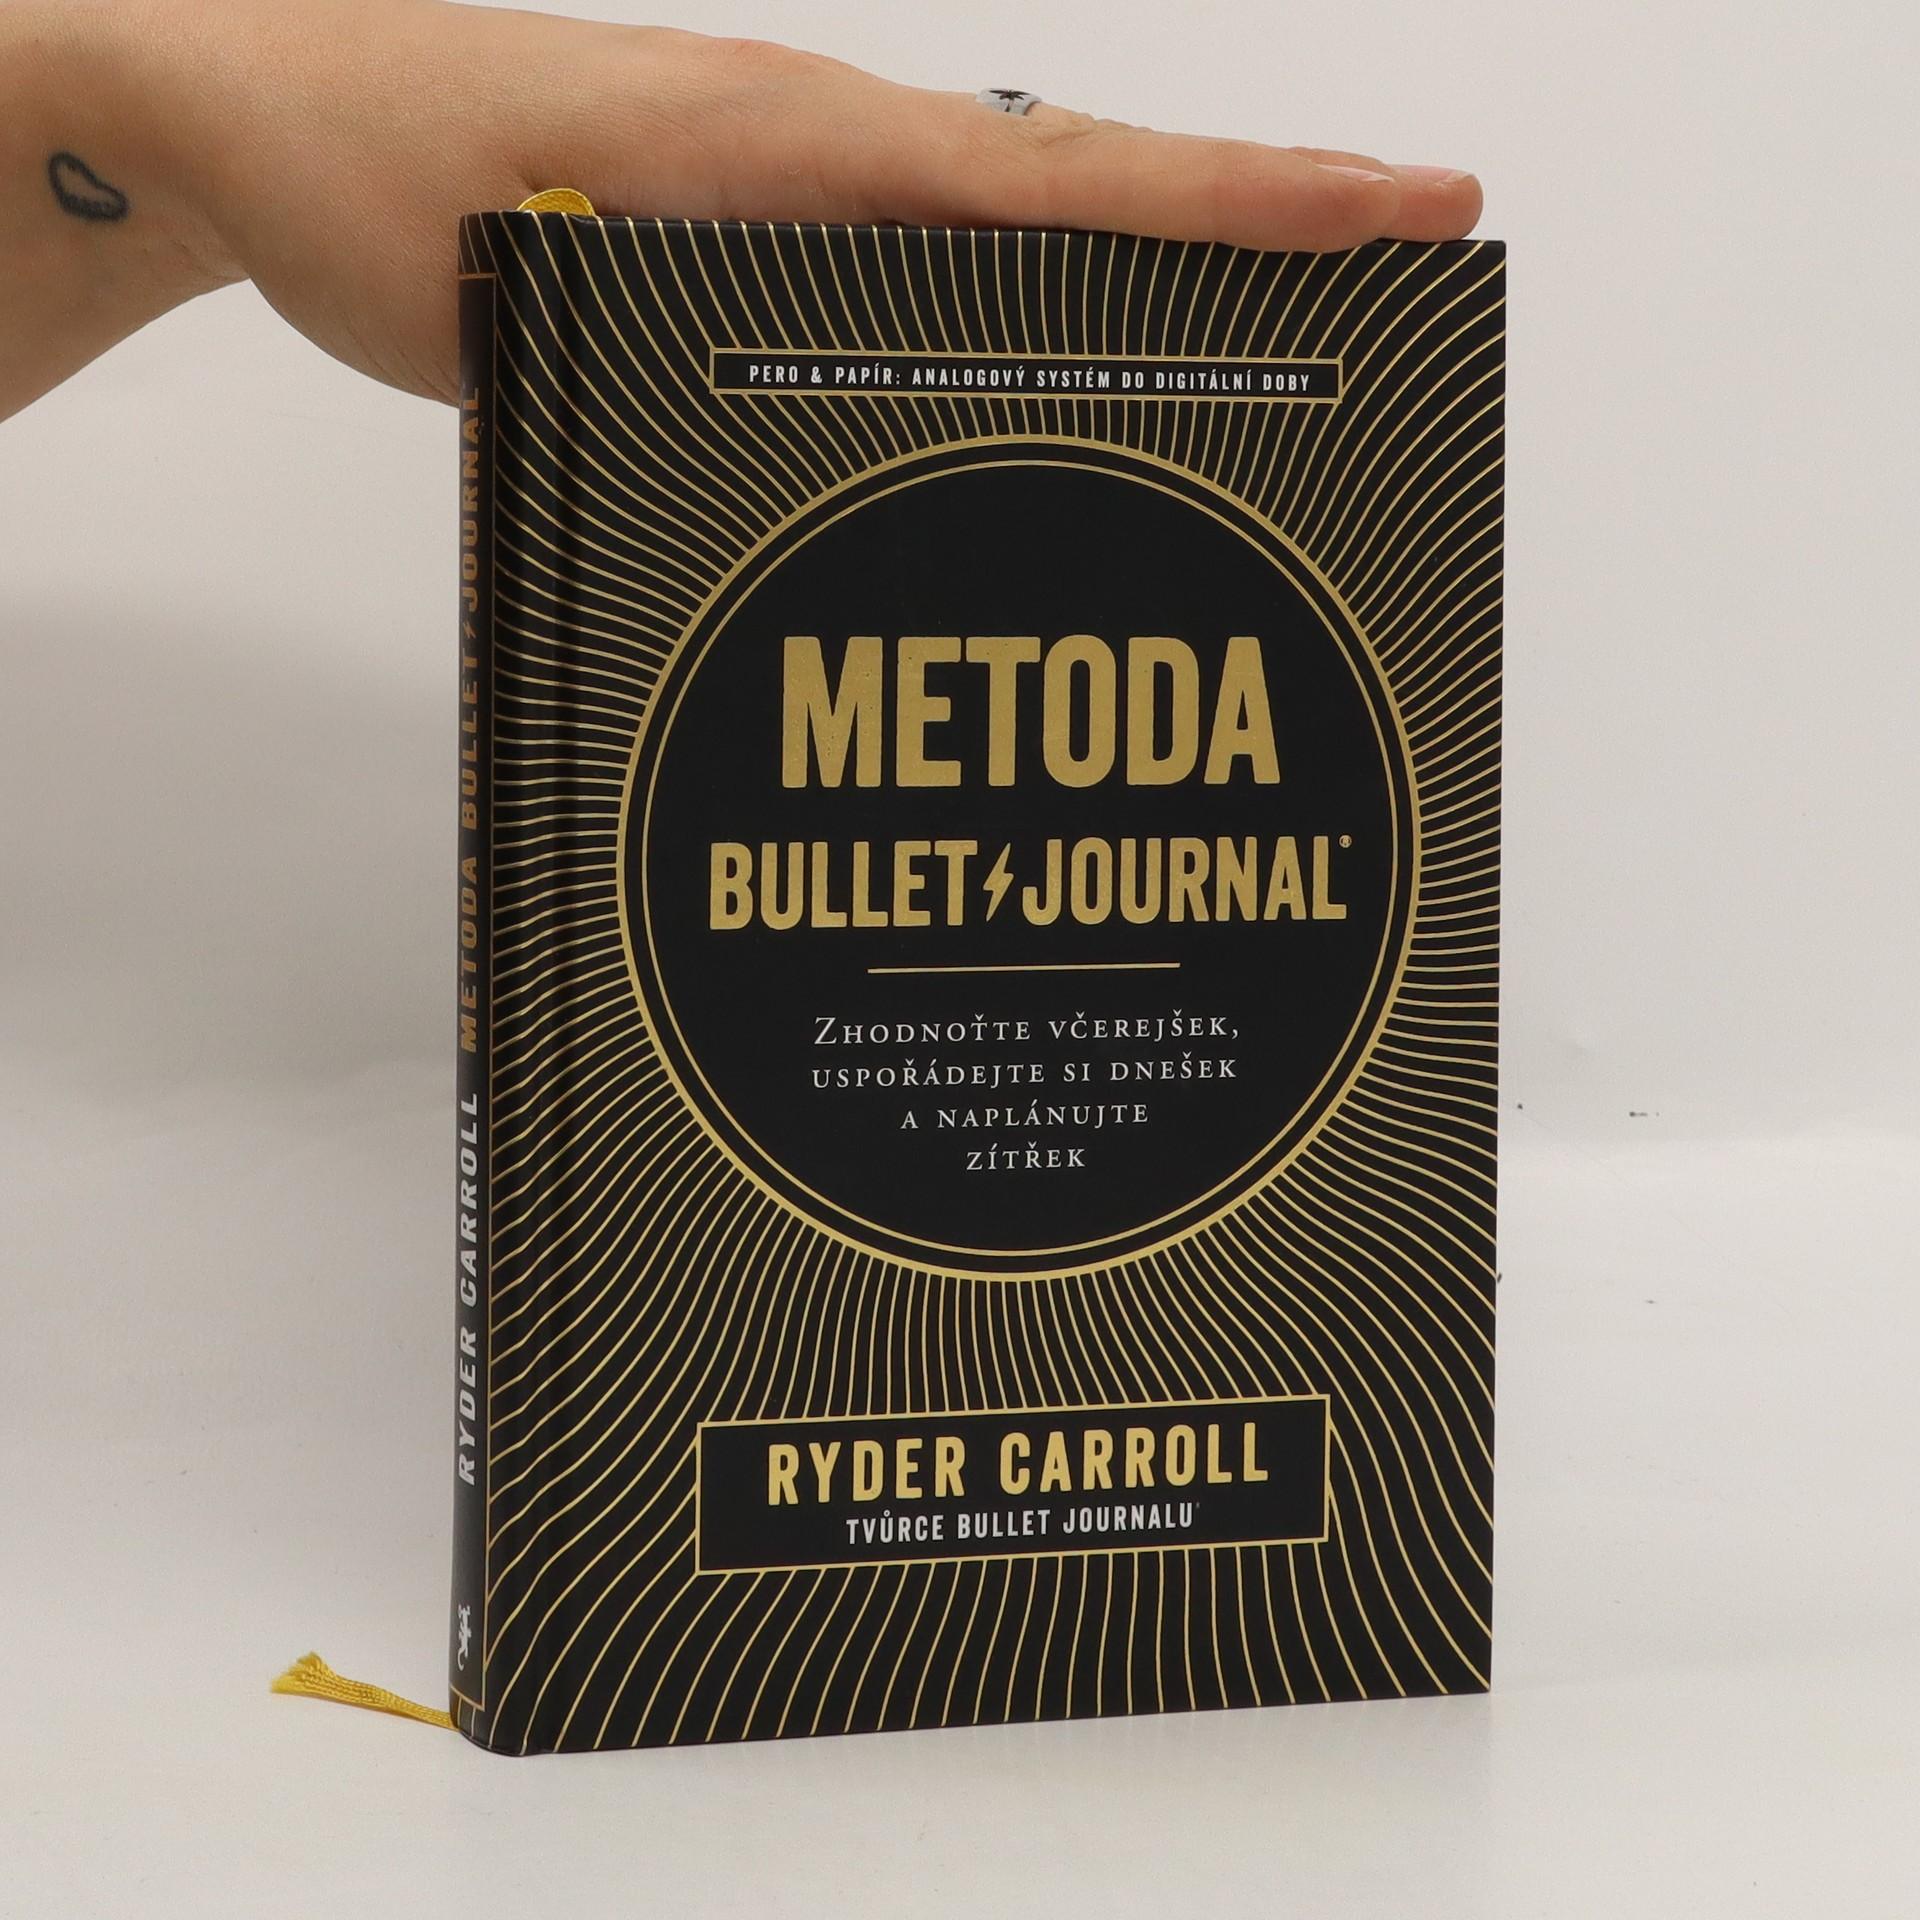 antikvární kniha Metoda Bullet Journal, 2019